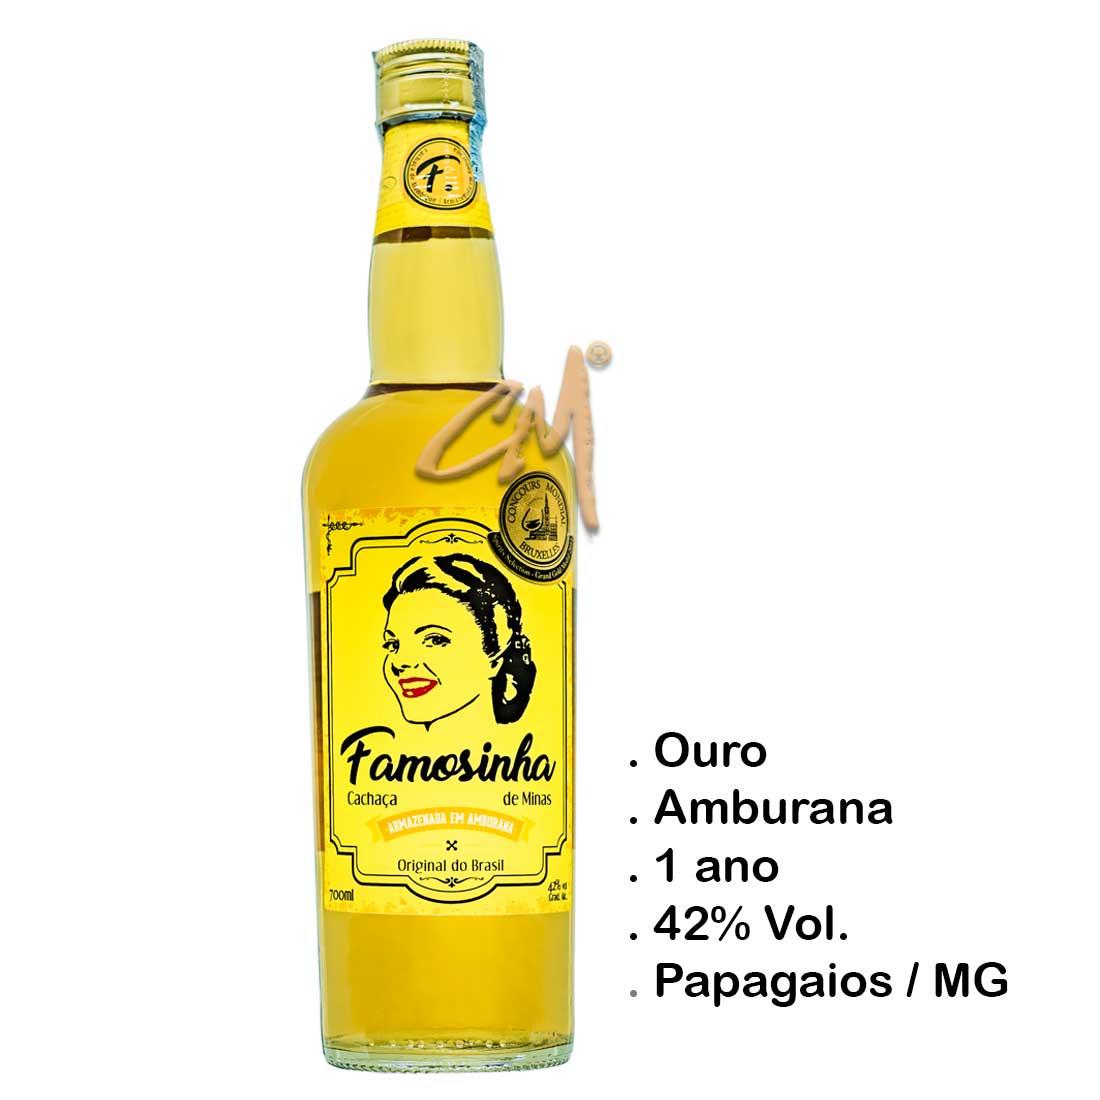 Cachaça Famosinha de Minas 700 ml (Papagaios - MG)